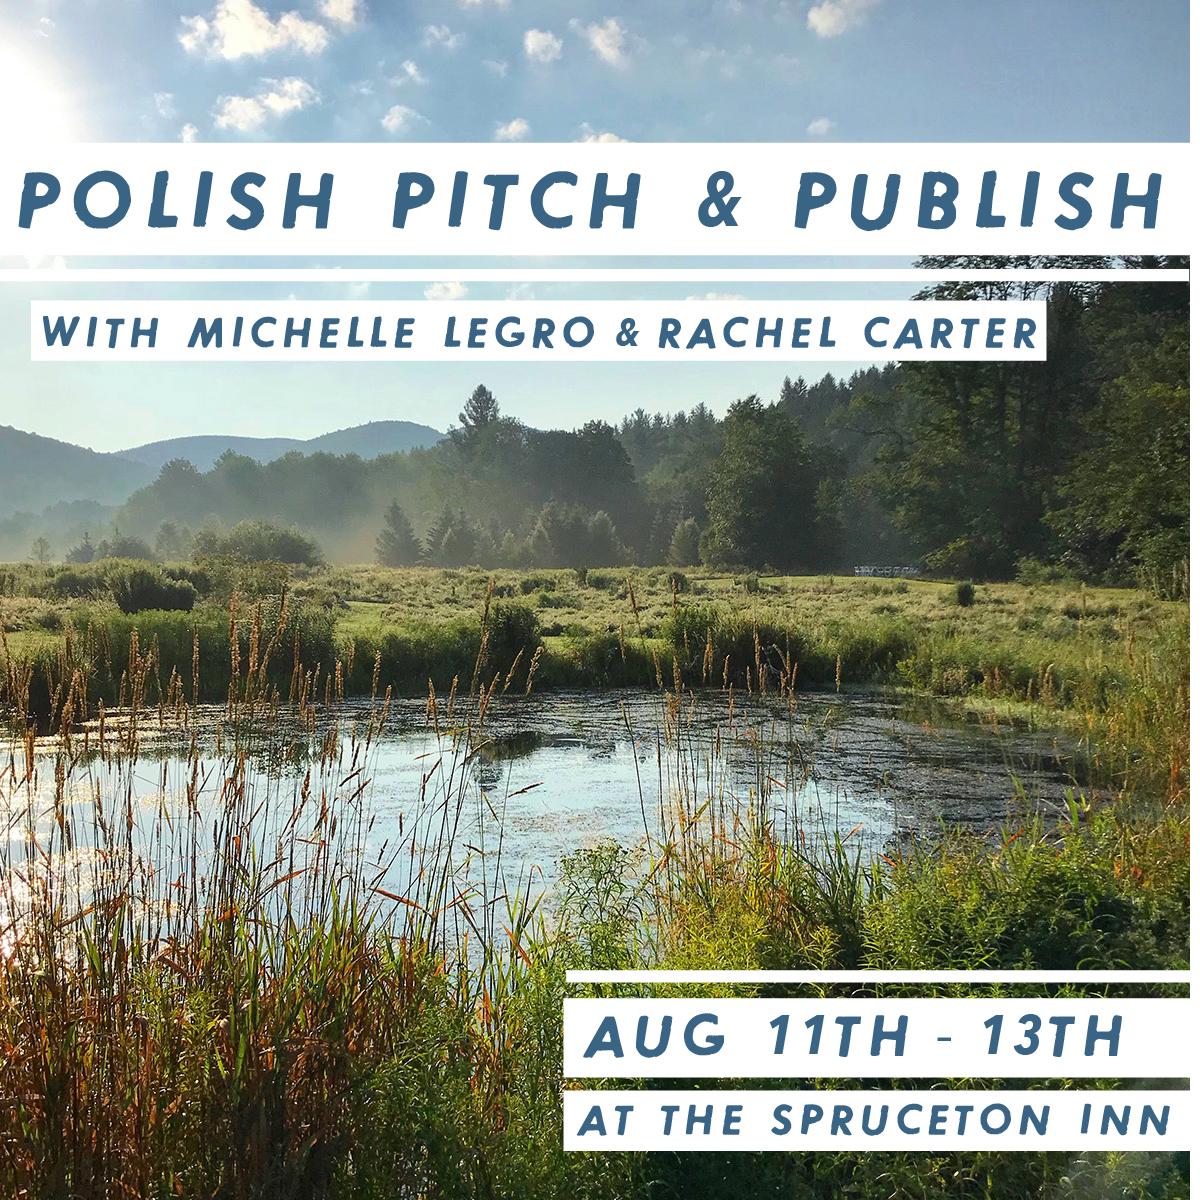 Polish Pitch & Publish at the Spruceton Inn.jpg